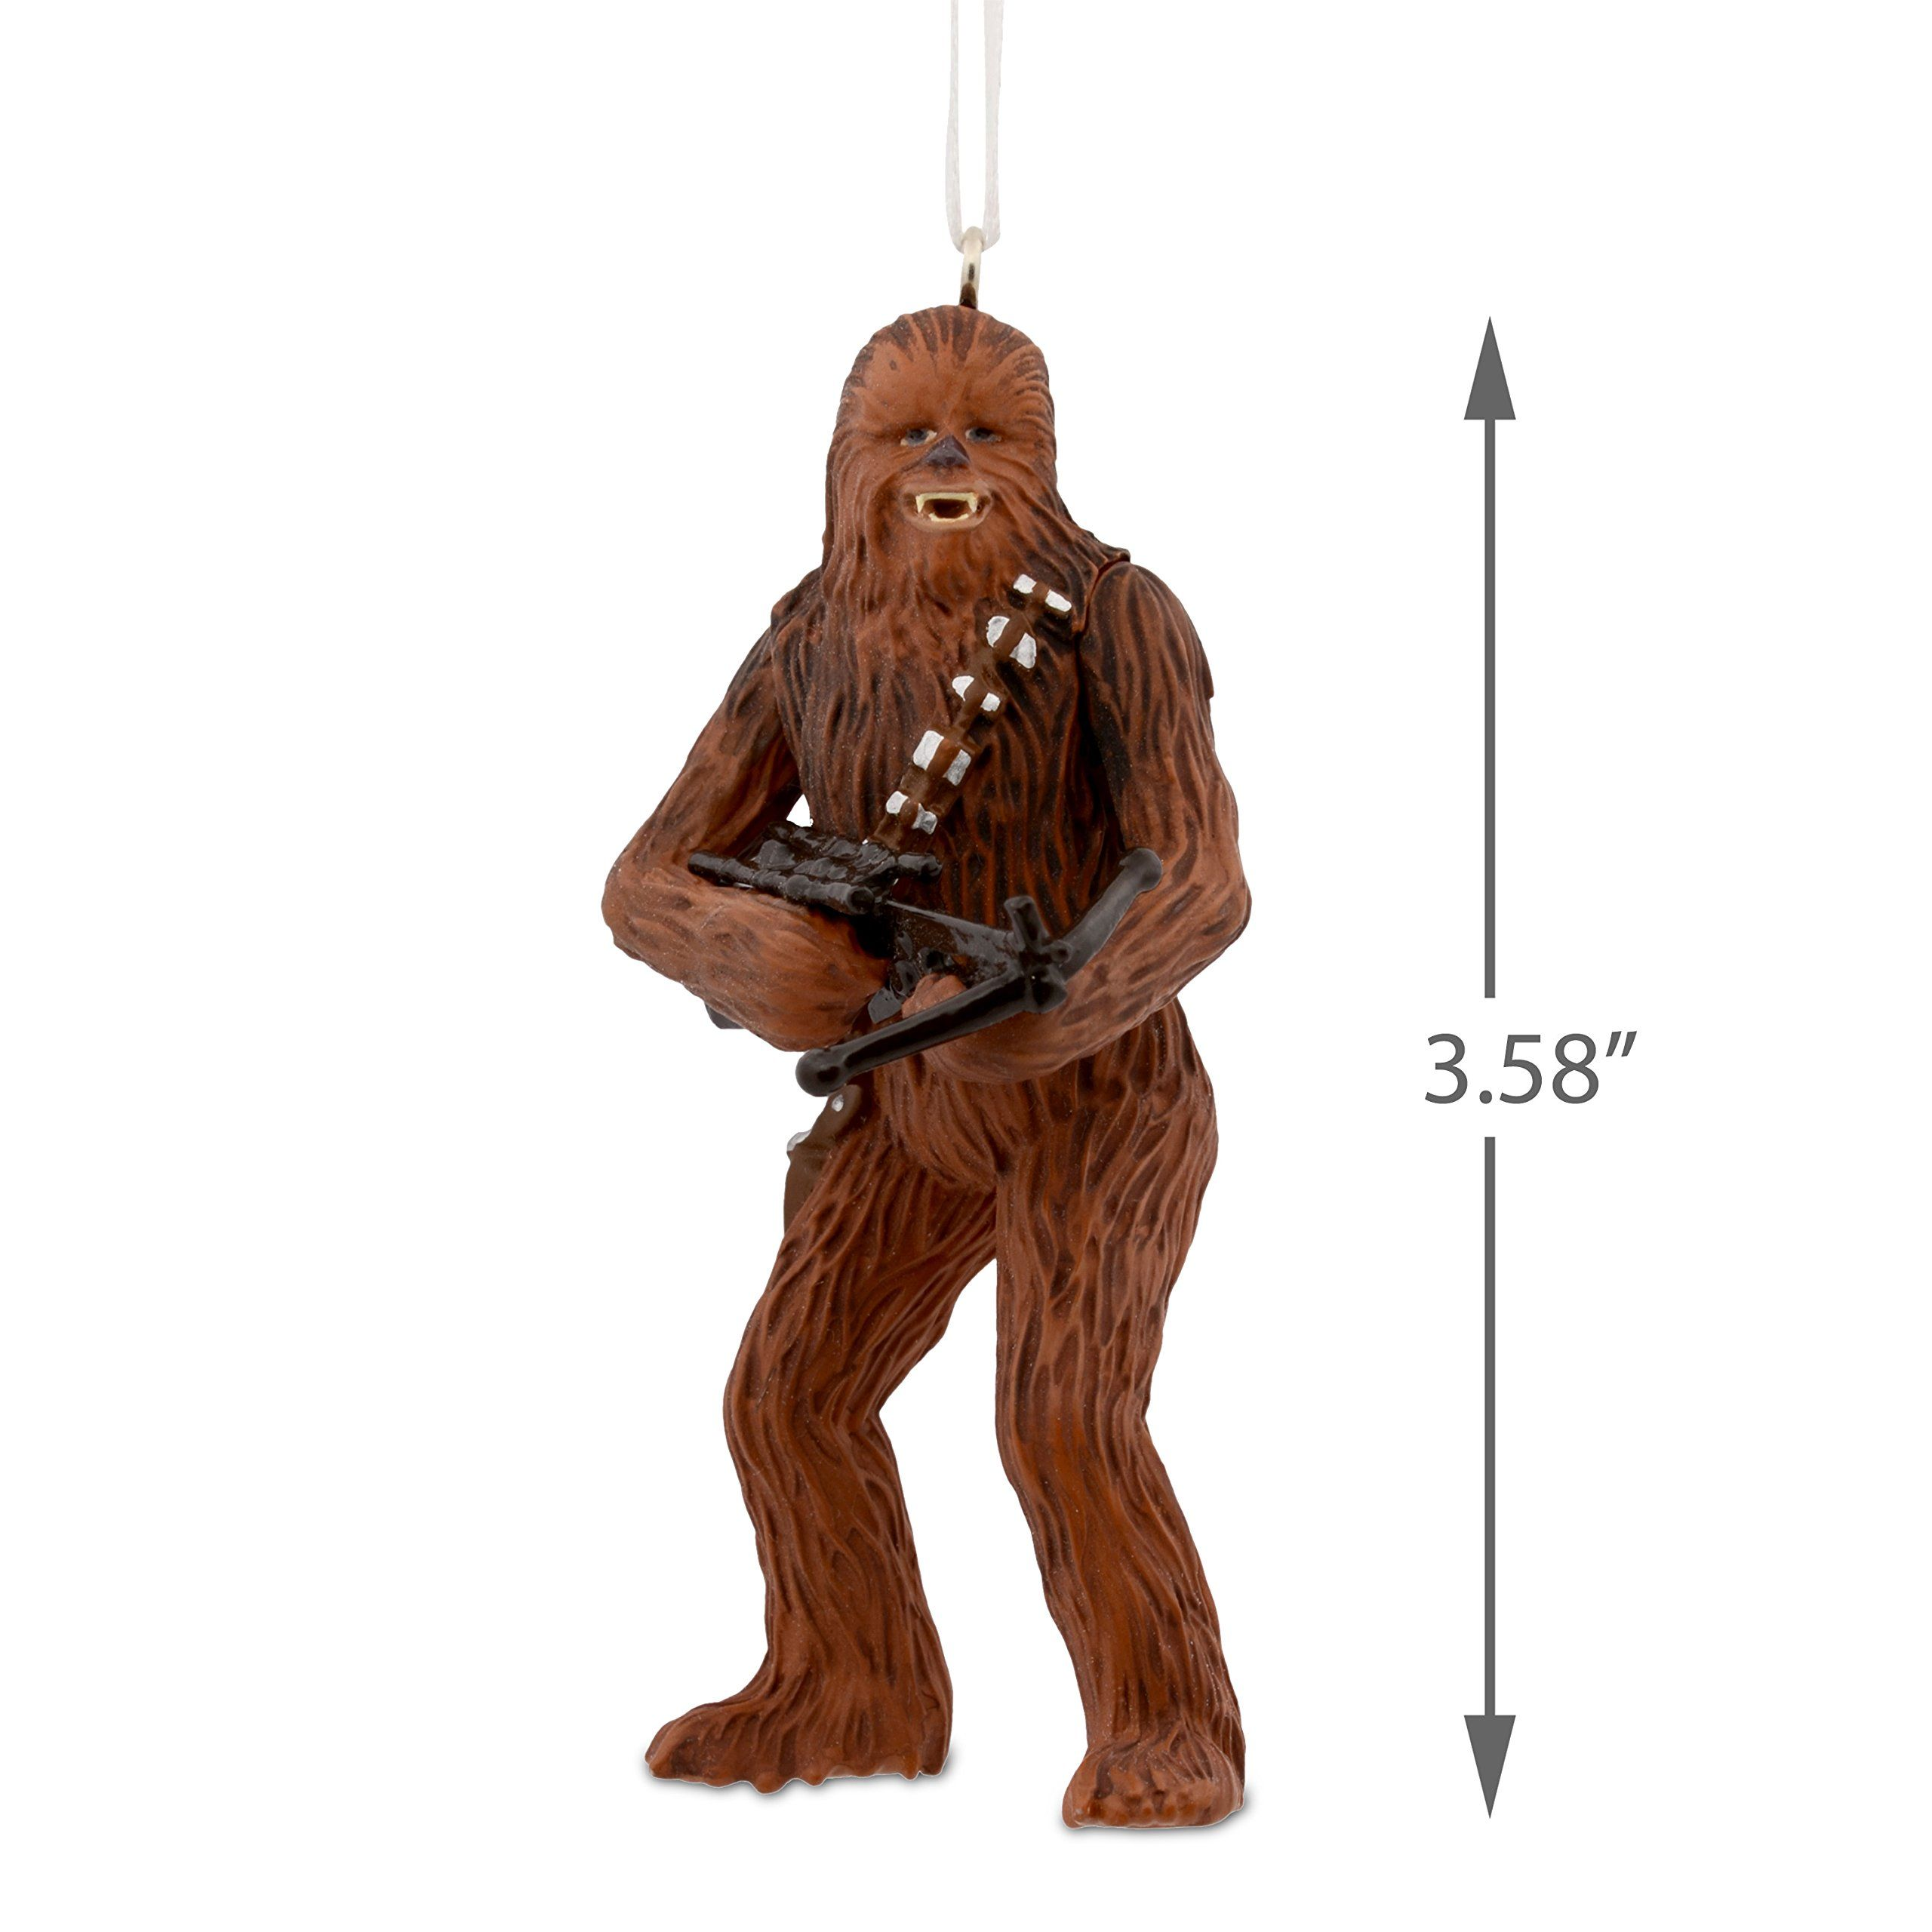 Hallmark Christmas Ornament Star Wars Chewbacca with